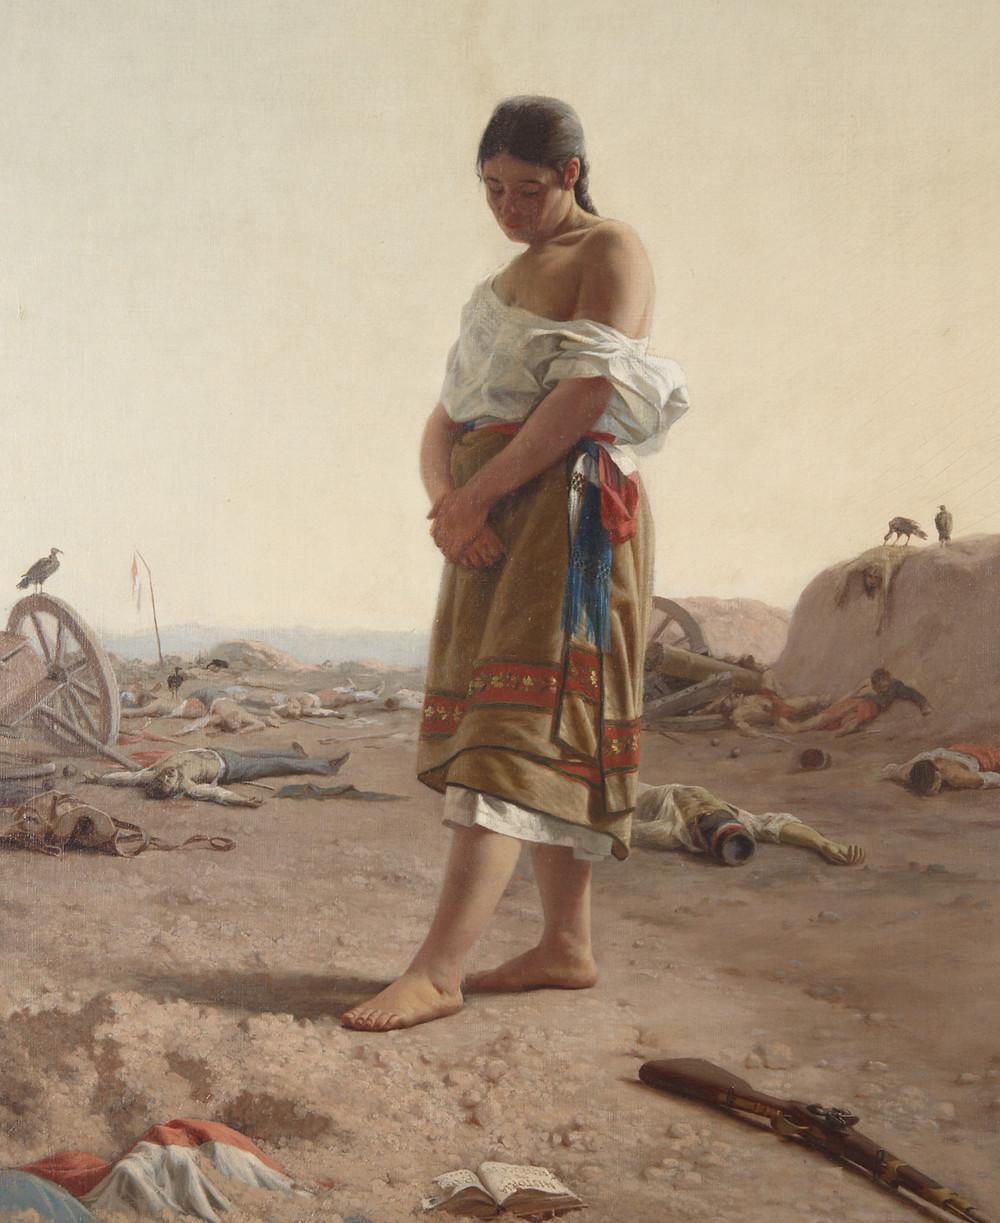 'La Paraguaya', del uruguayo Juan Manuel Blanes, 1879; Museo Nacional de Artes Visuales de Uruguay